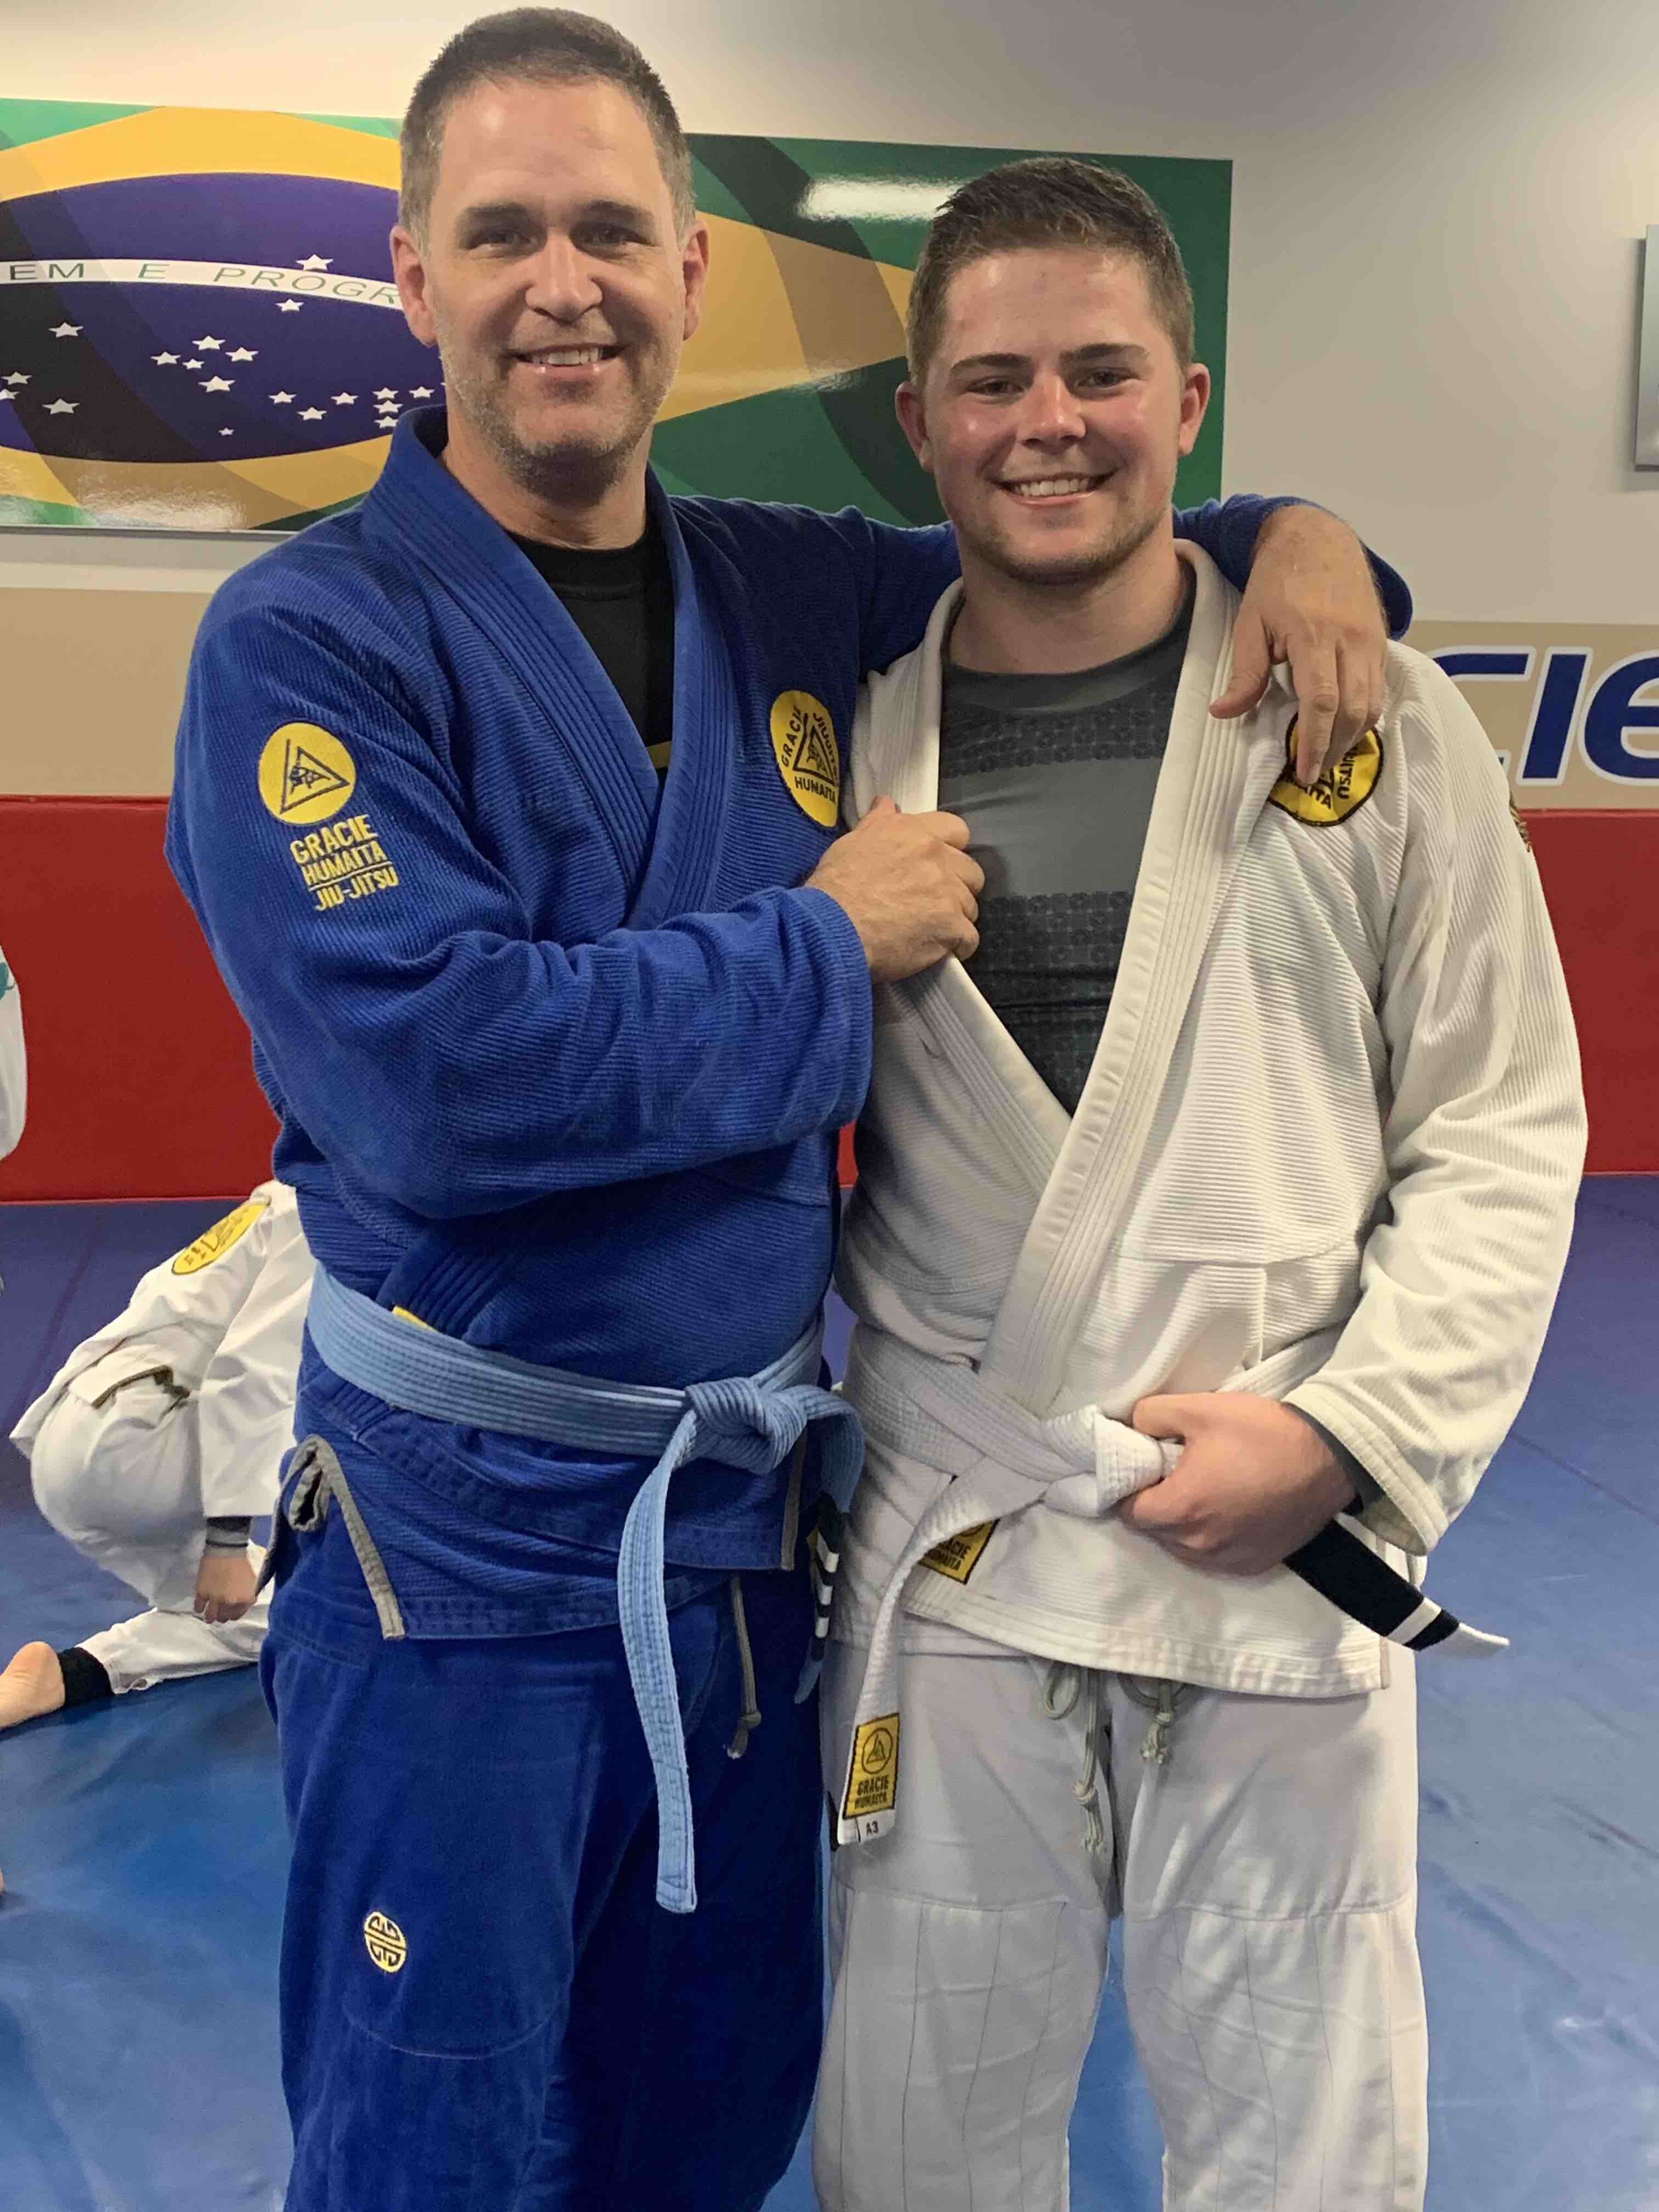 matt-white-dad-blue-jiu-jitsu-promotion